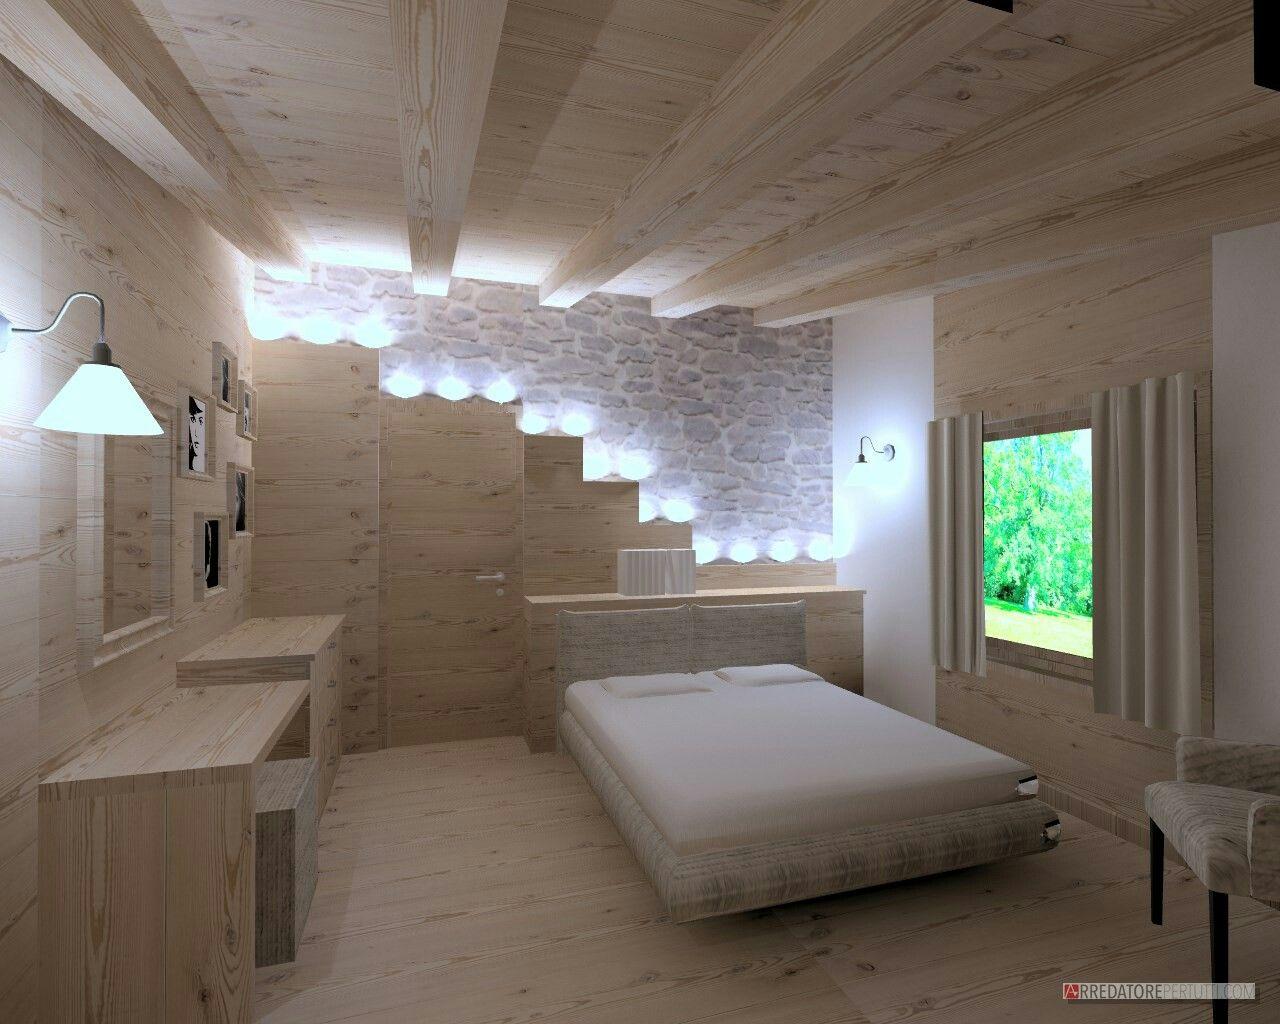 Camera rustica parete illuminata parete sasso e legno for Arredatore d interni online gratis